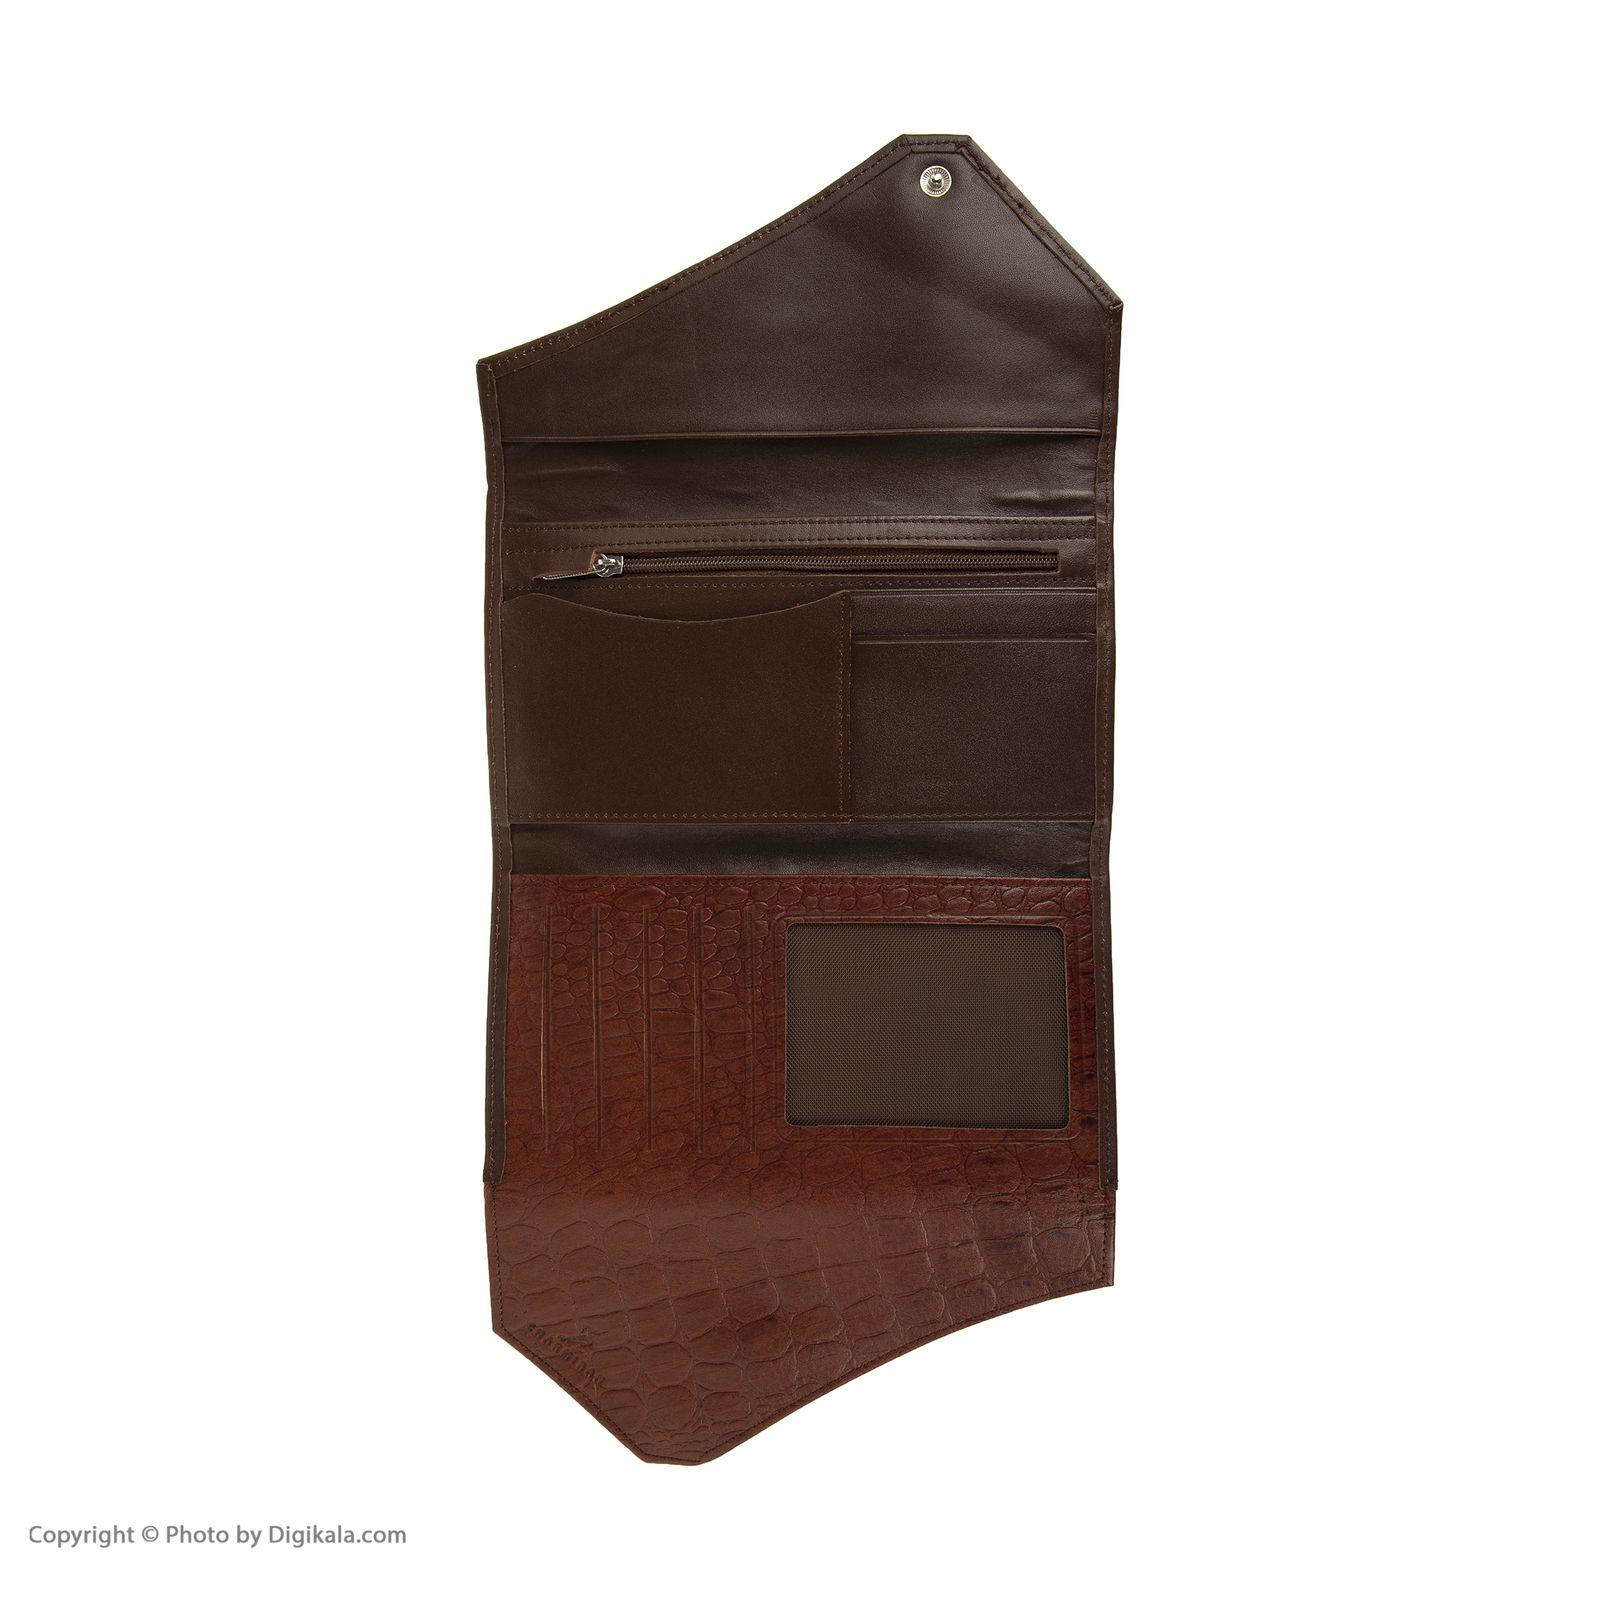 کیف پول چرمیران مدل 6059301 -  - 5